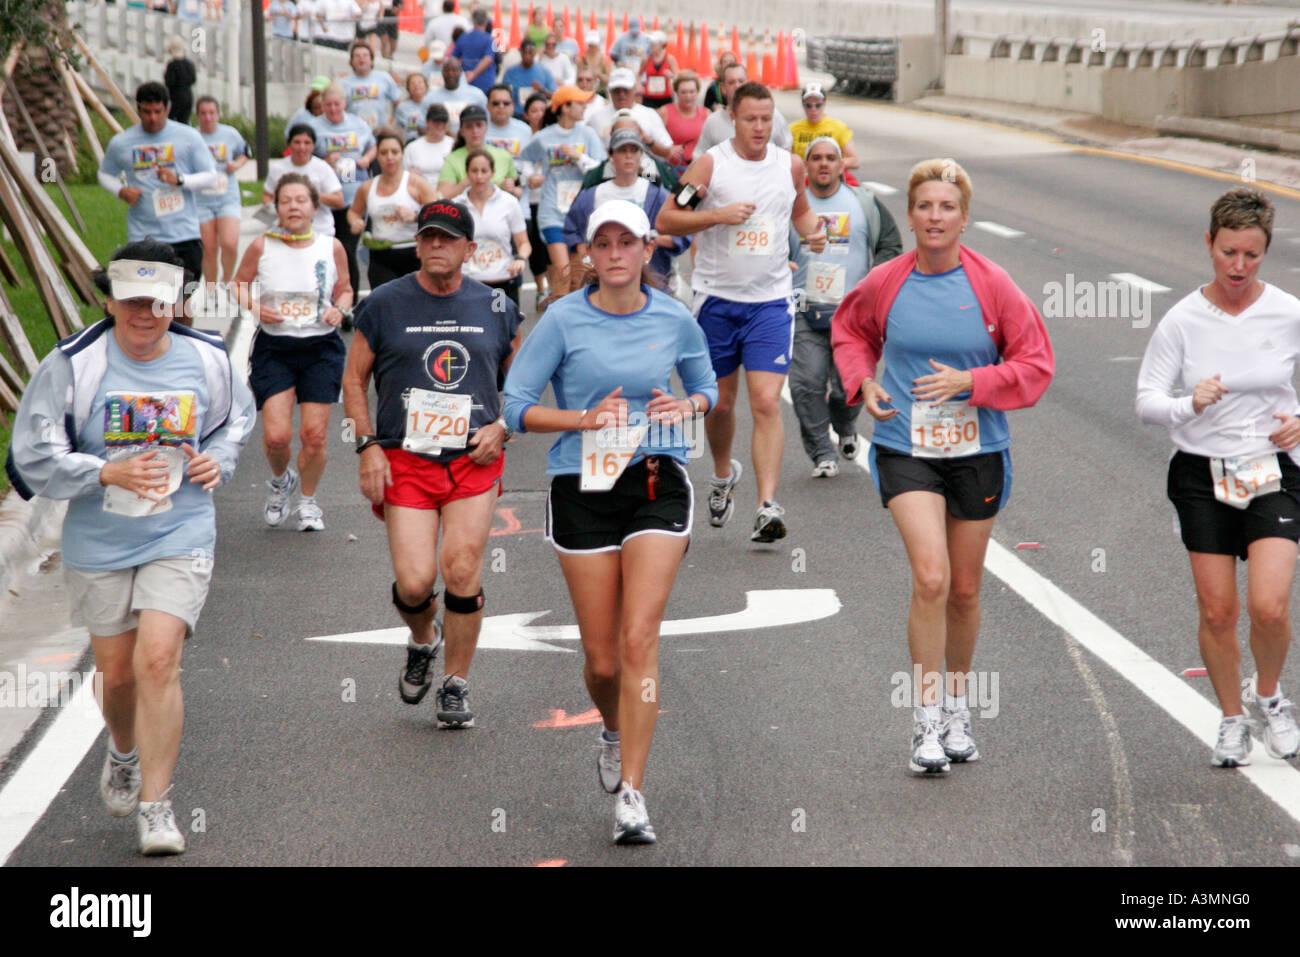 Photos From Rock '-n'- Roll Virginia Beach Half Marathon